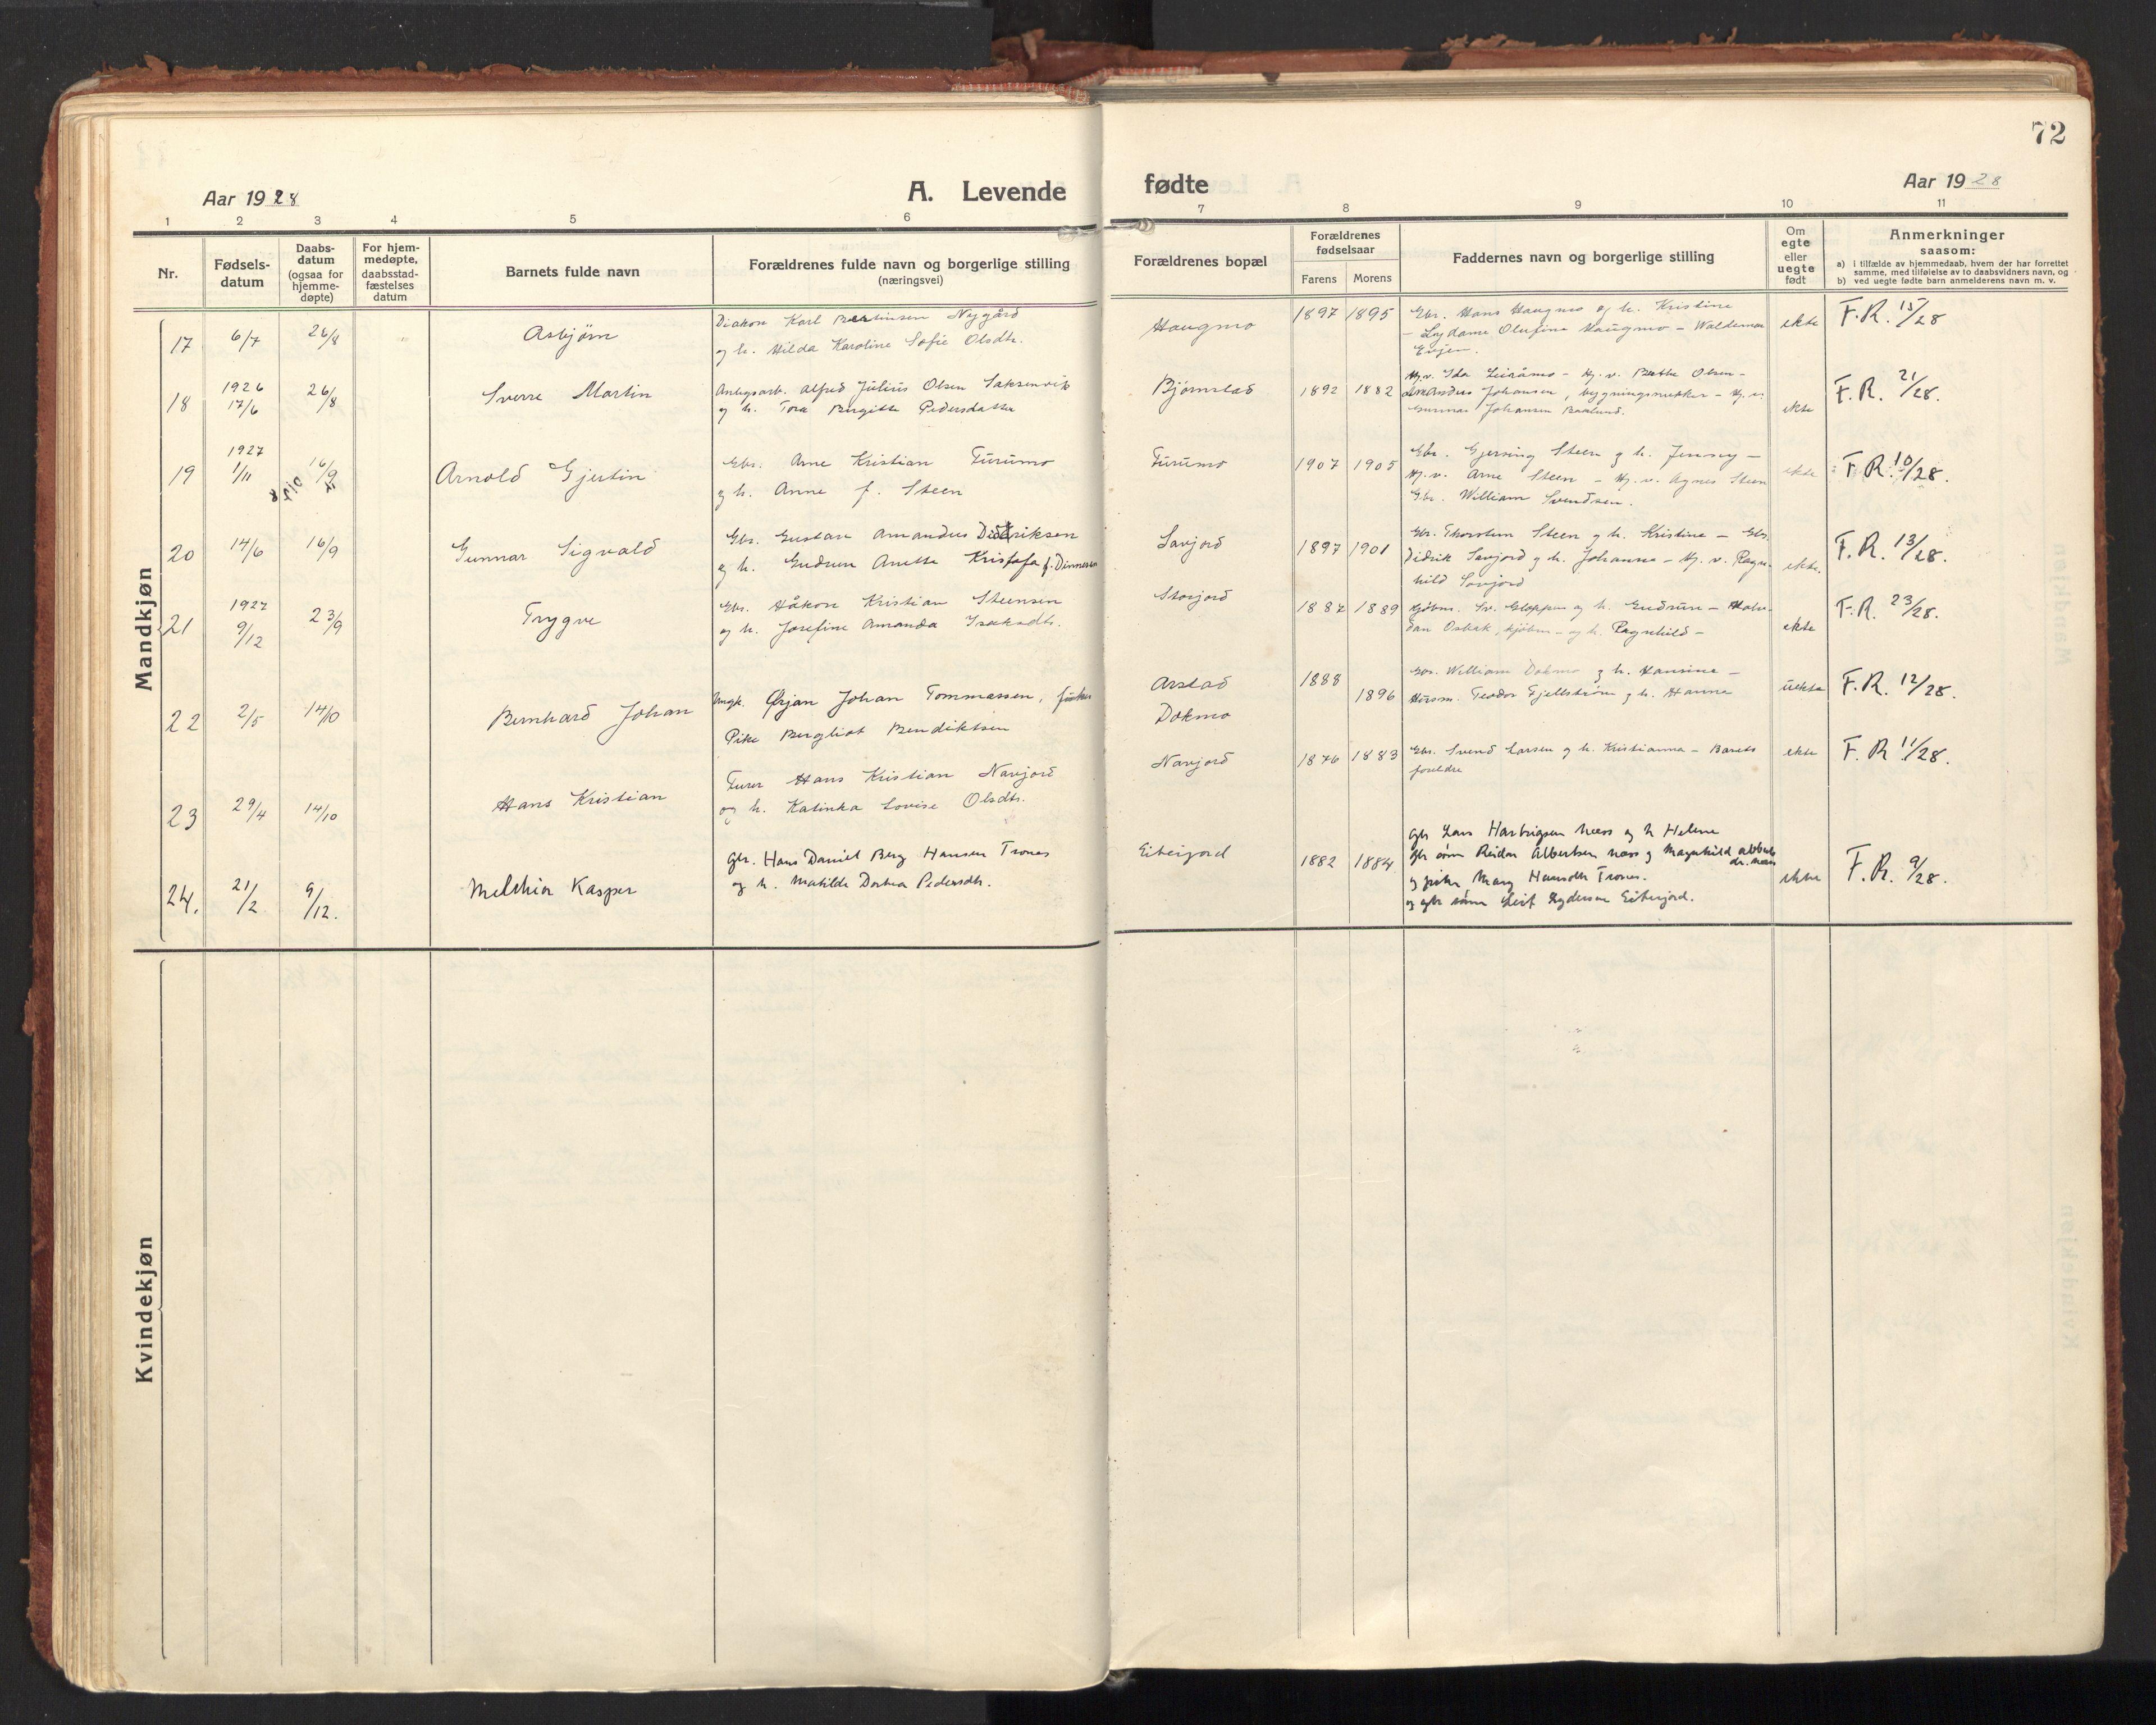 SAT, Ministerialprotokoller, klokkerbøker og fødselsregistre - Nordland, 846/L0650: Ministerialbok nr. 846A08, 1916-1935, s. 72